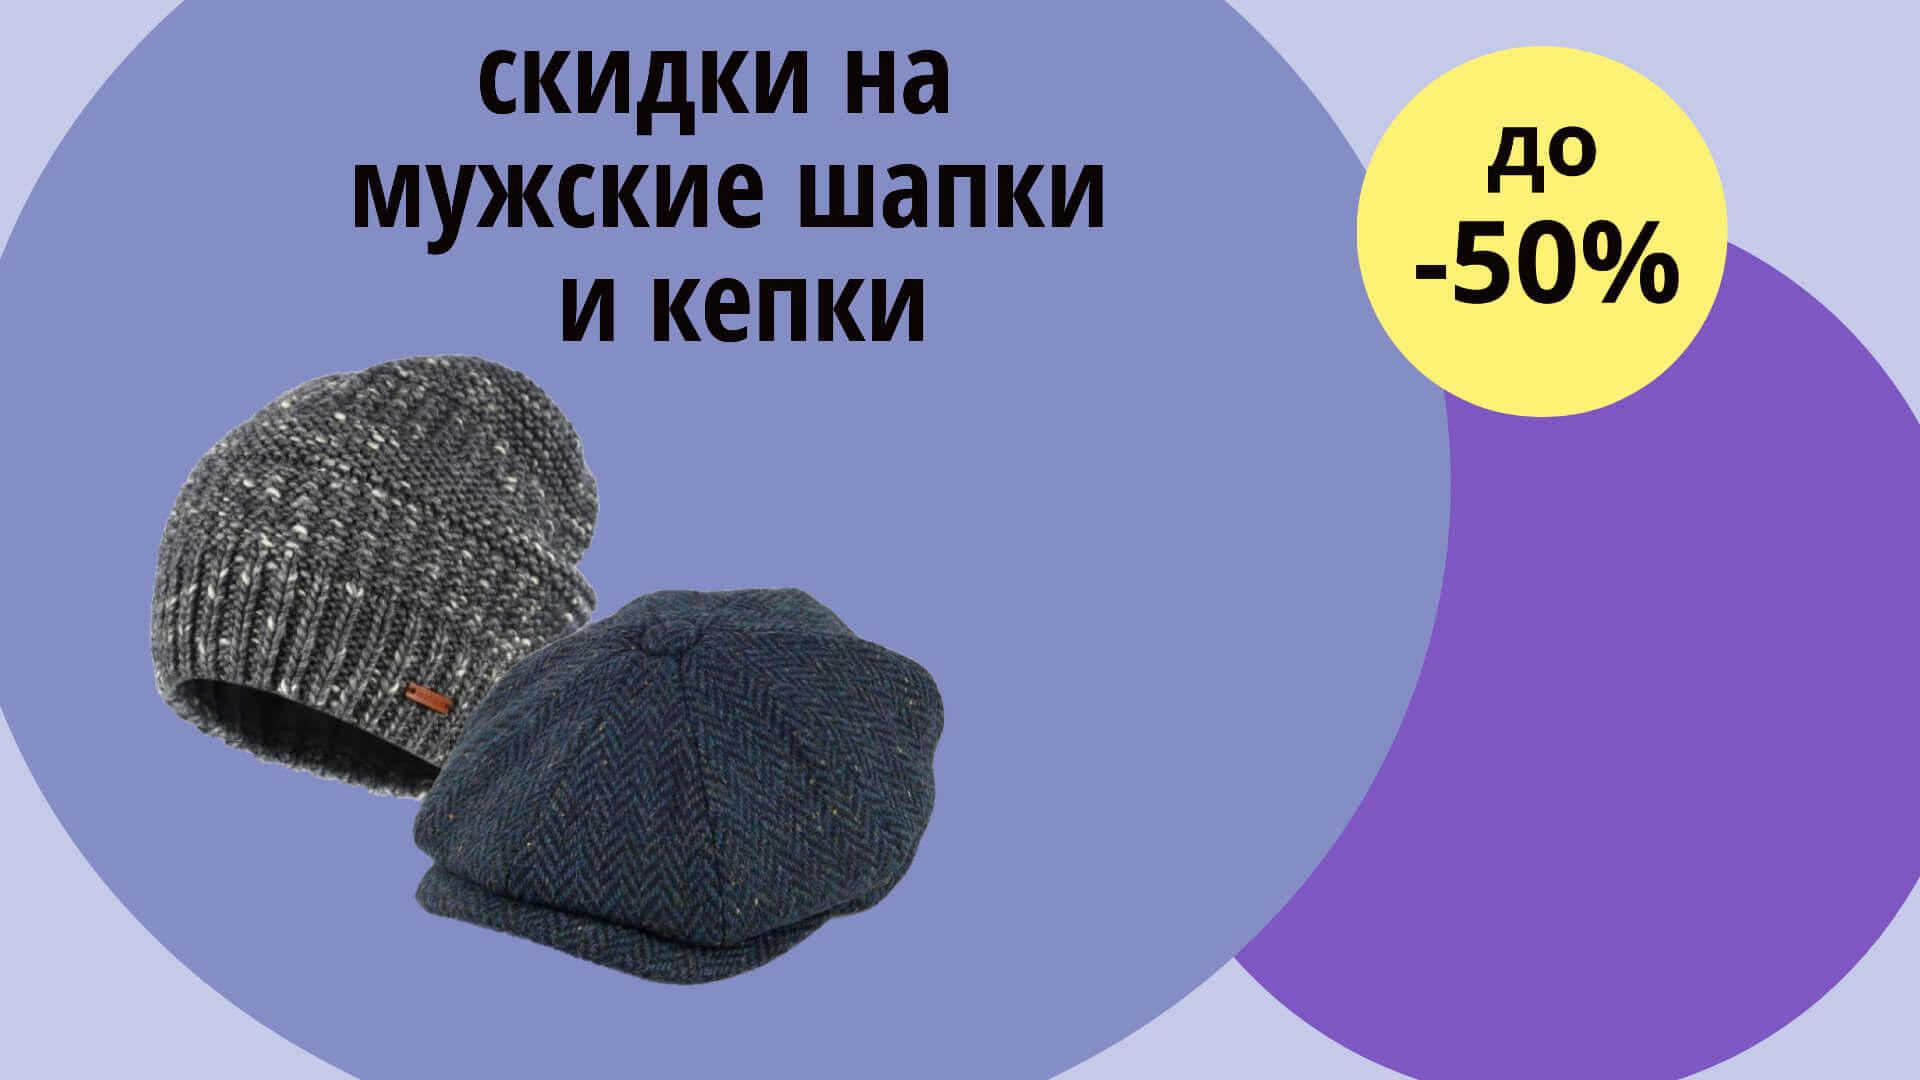 Скидки до 50% на мужские кепки, шапки и шляпы